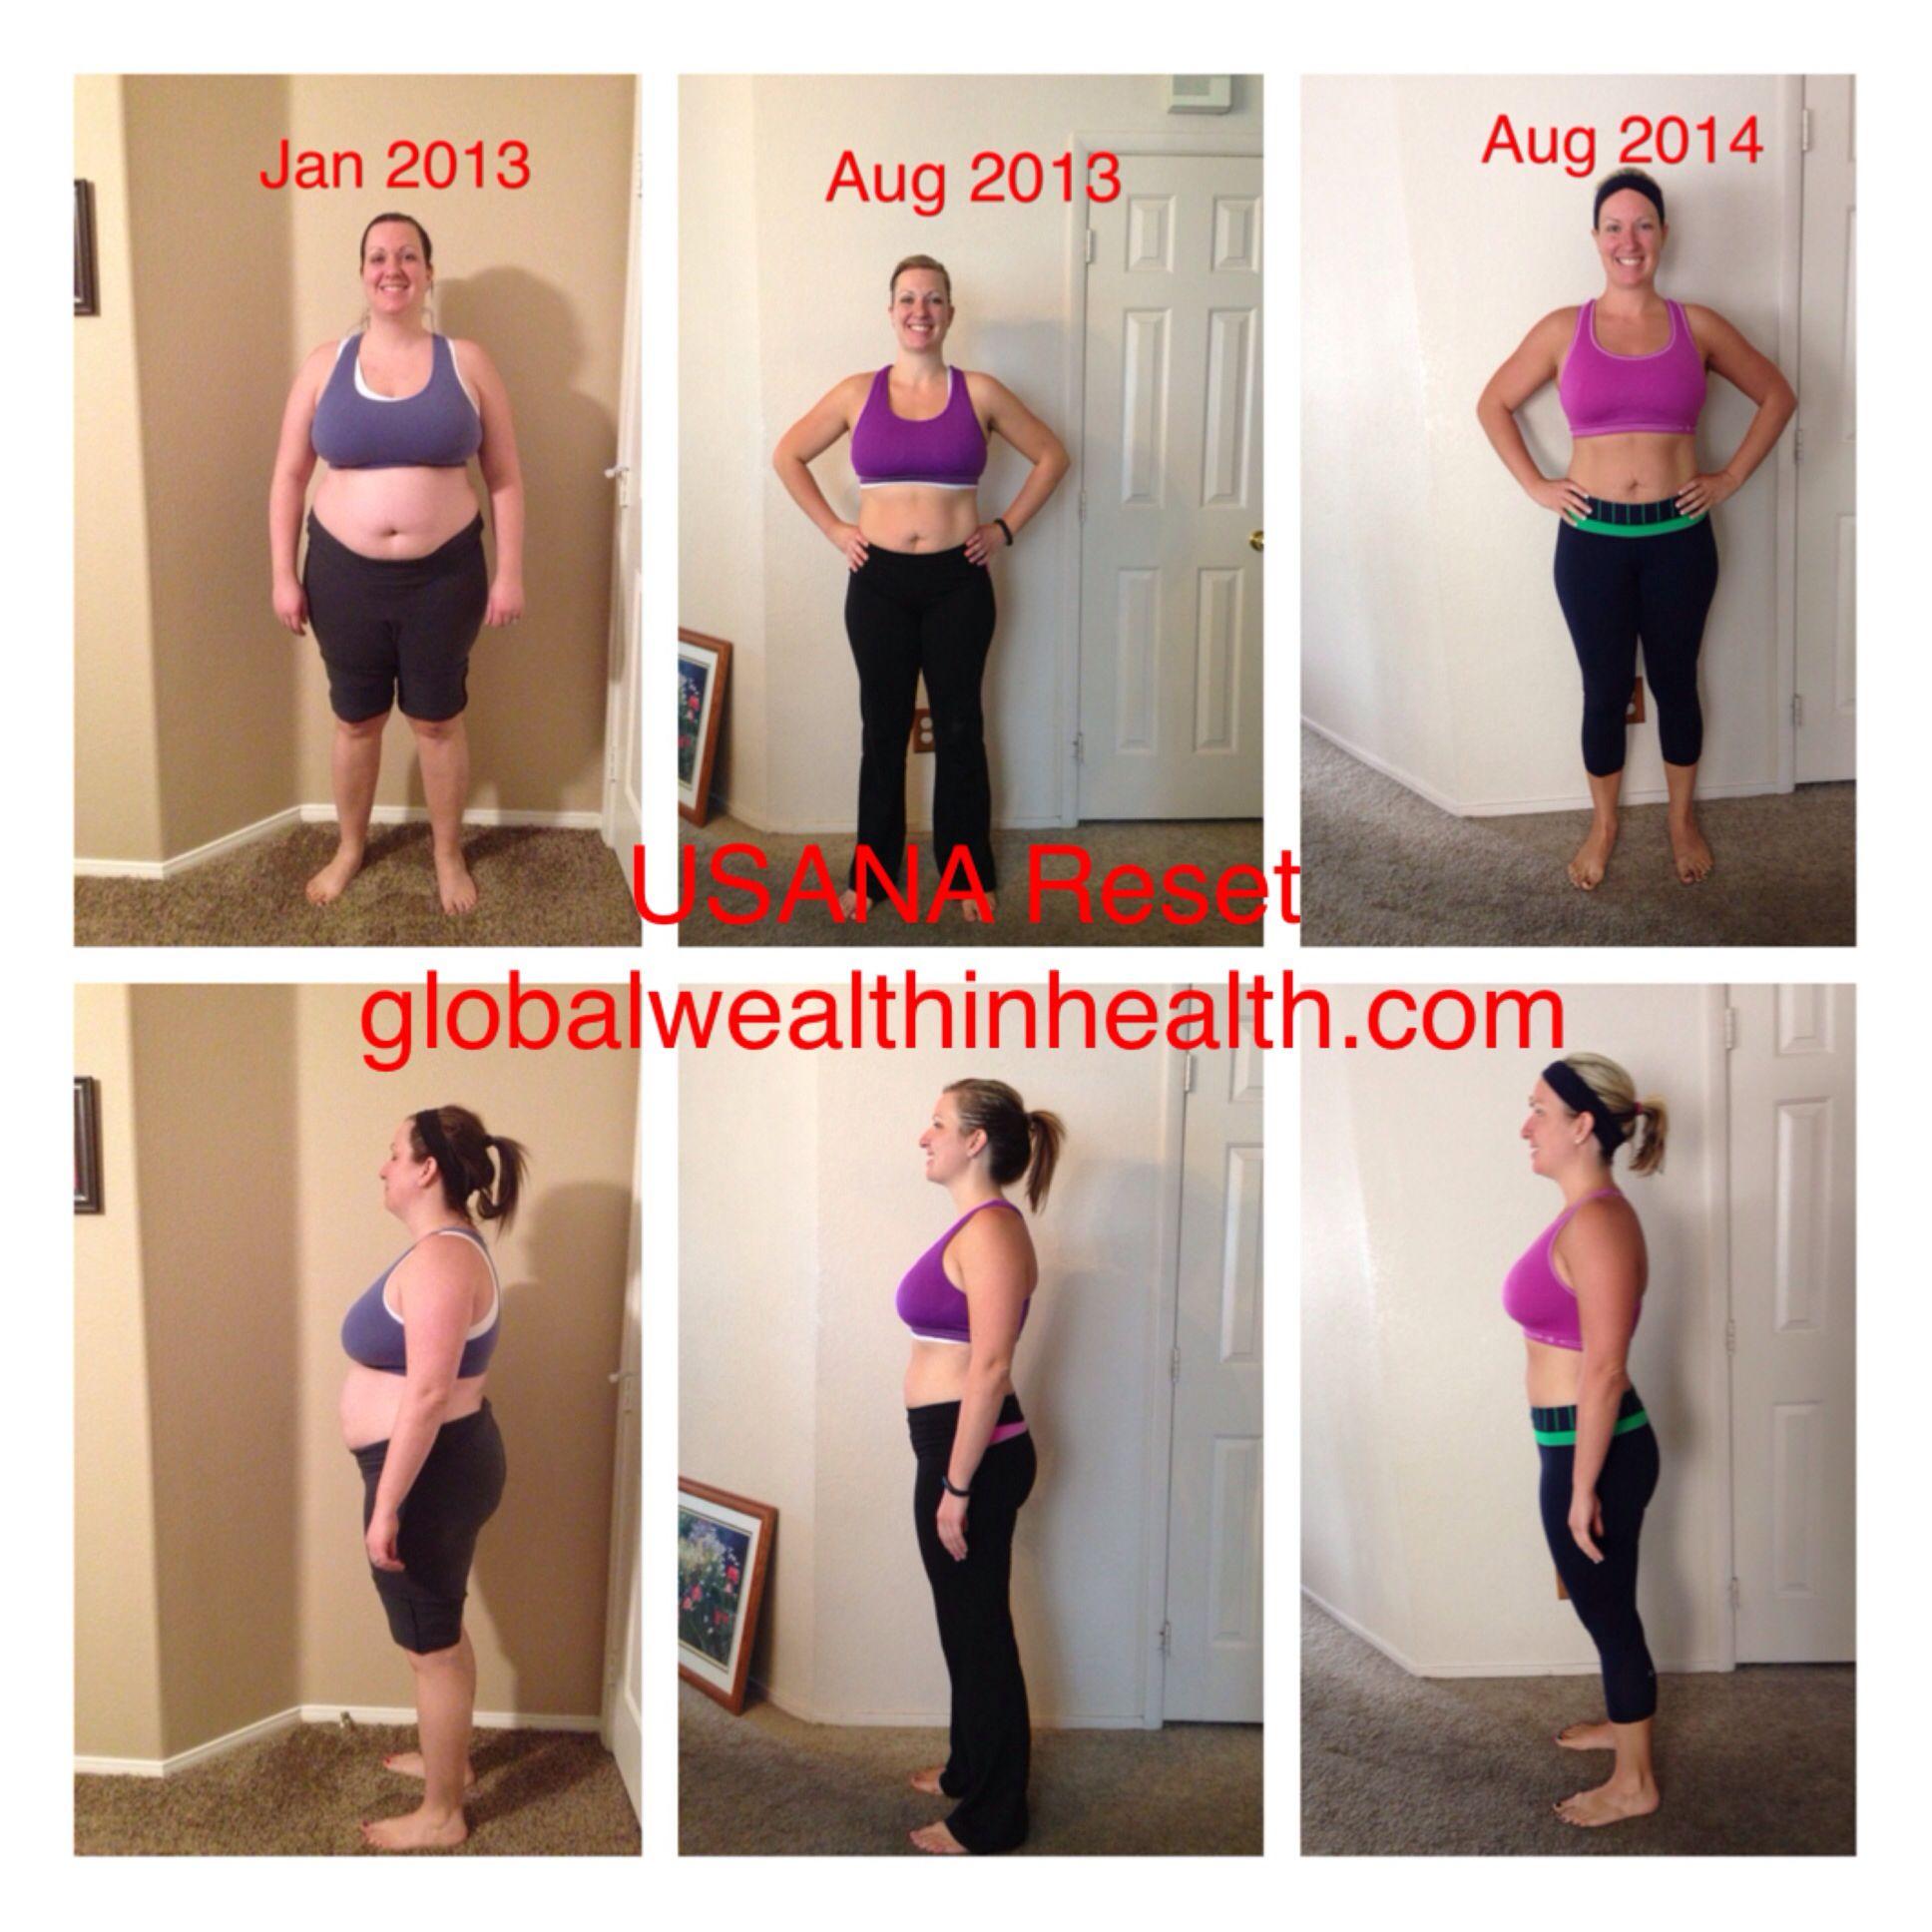 Health And Weight Transformation Usana Reset Program